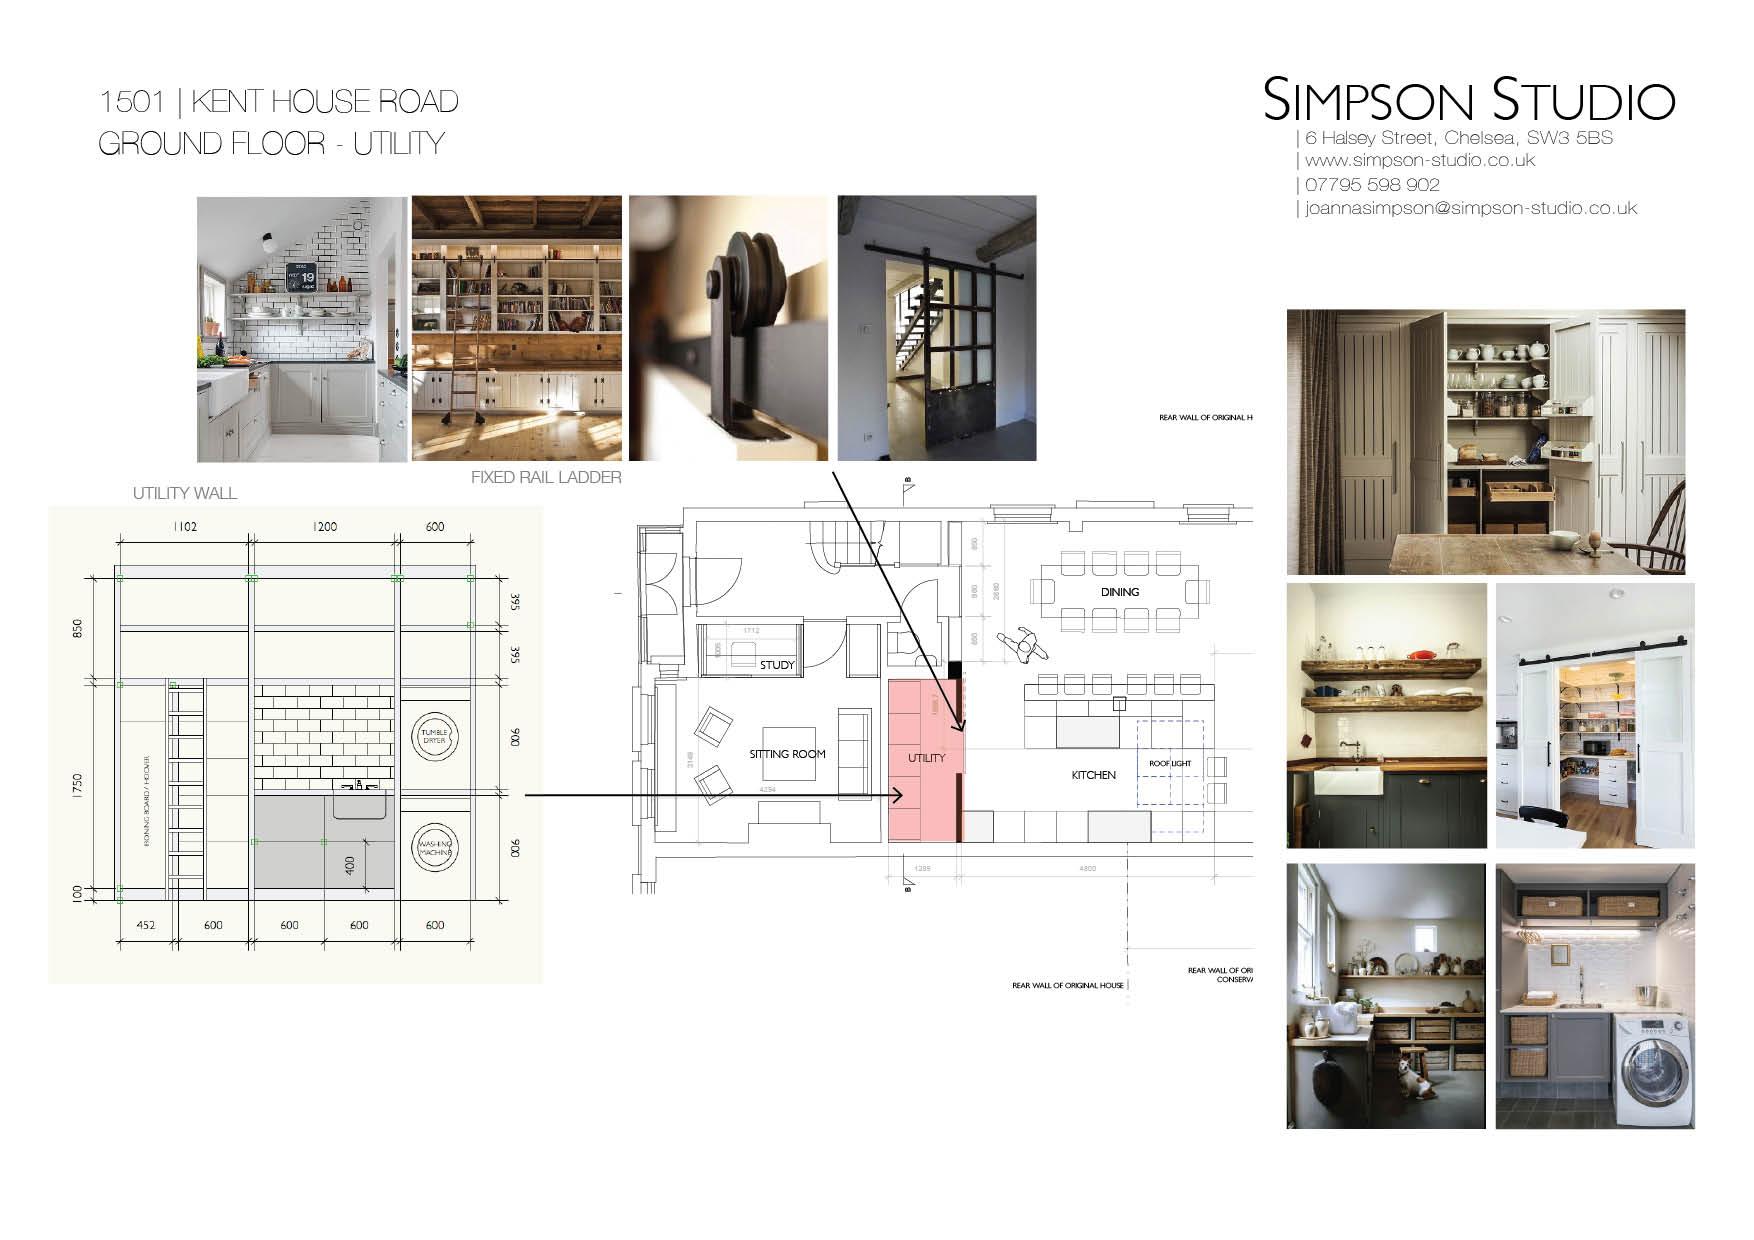 Kent House Road Room Planning6.jpg